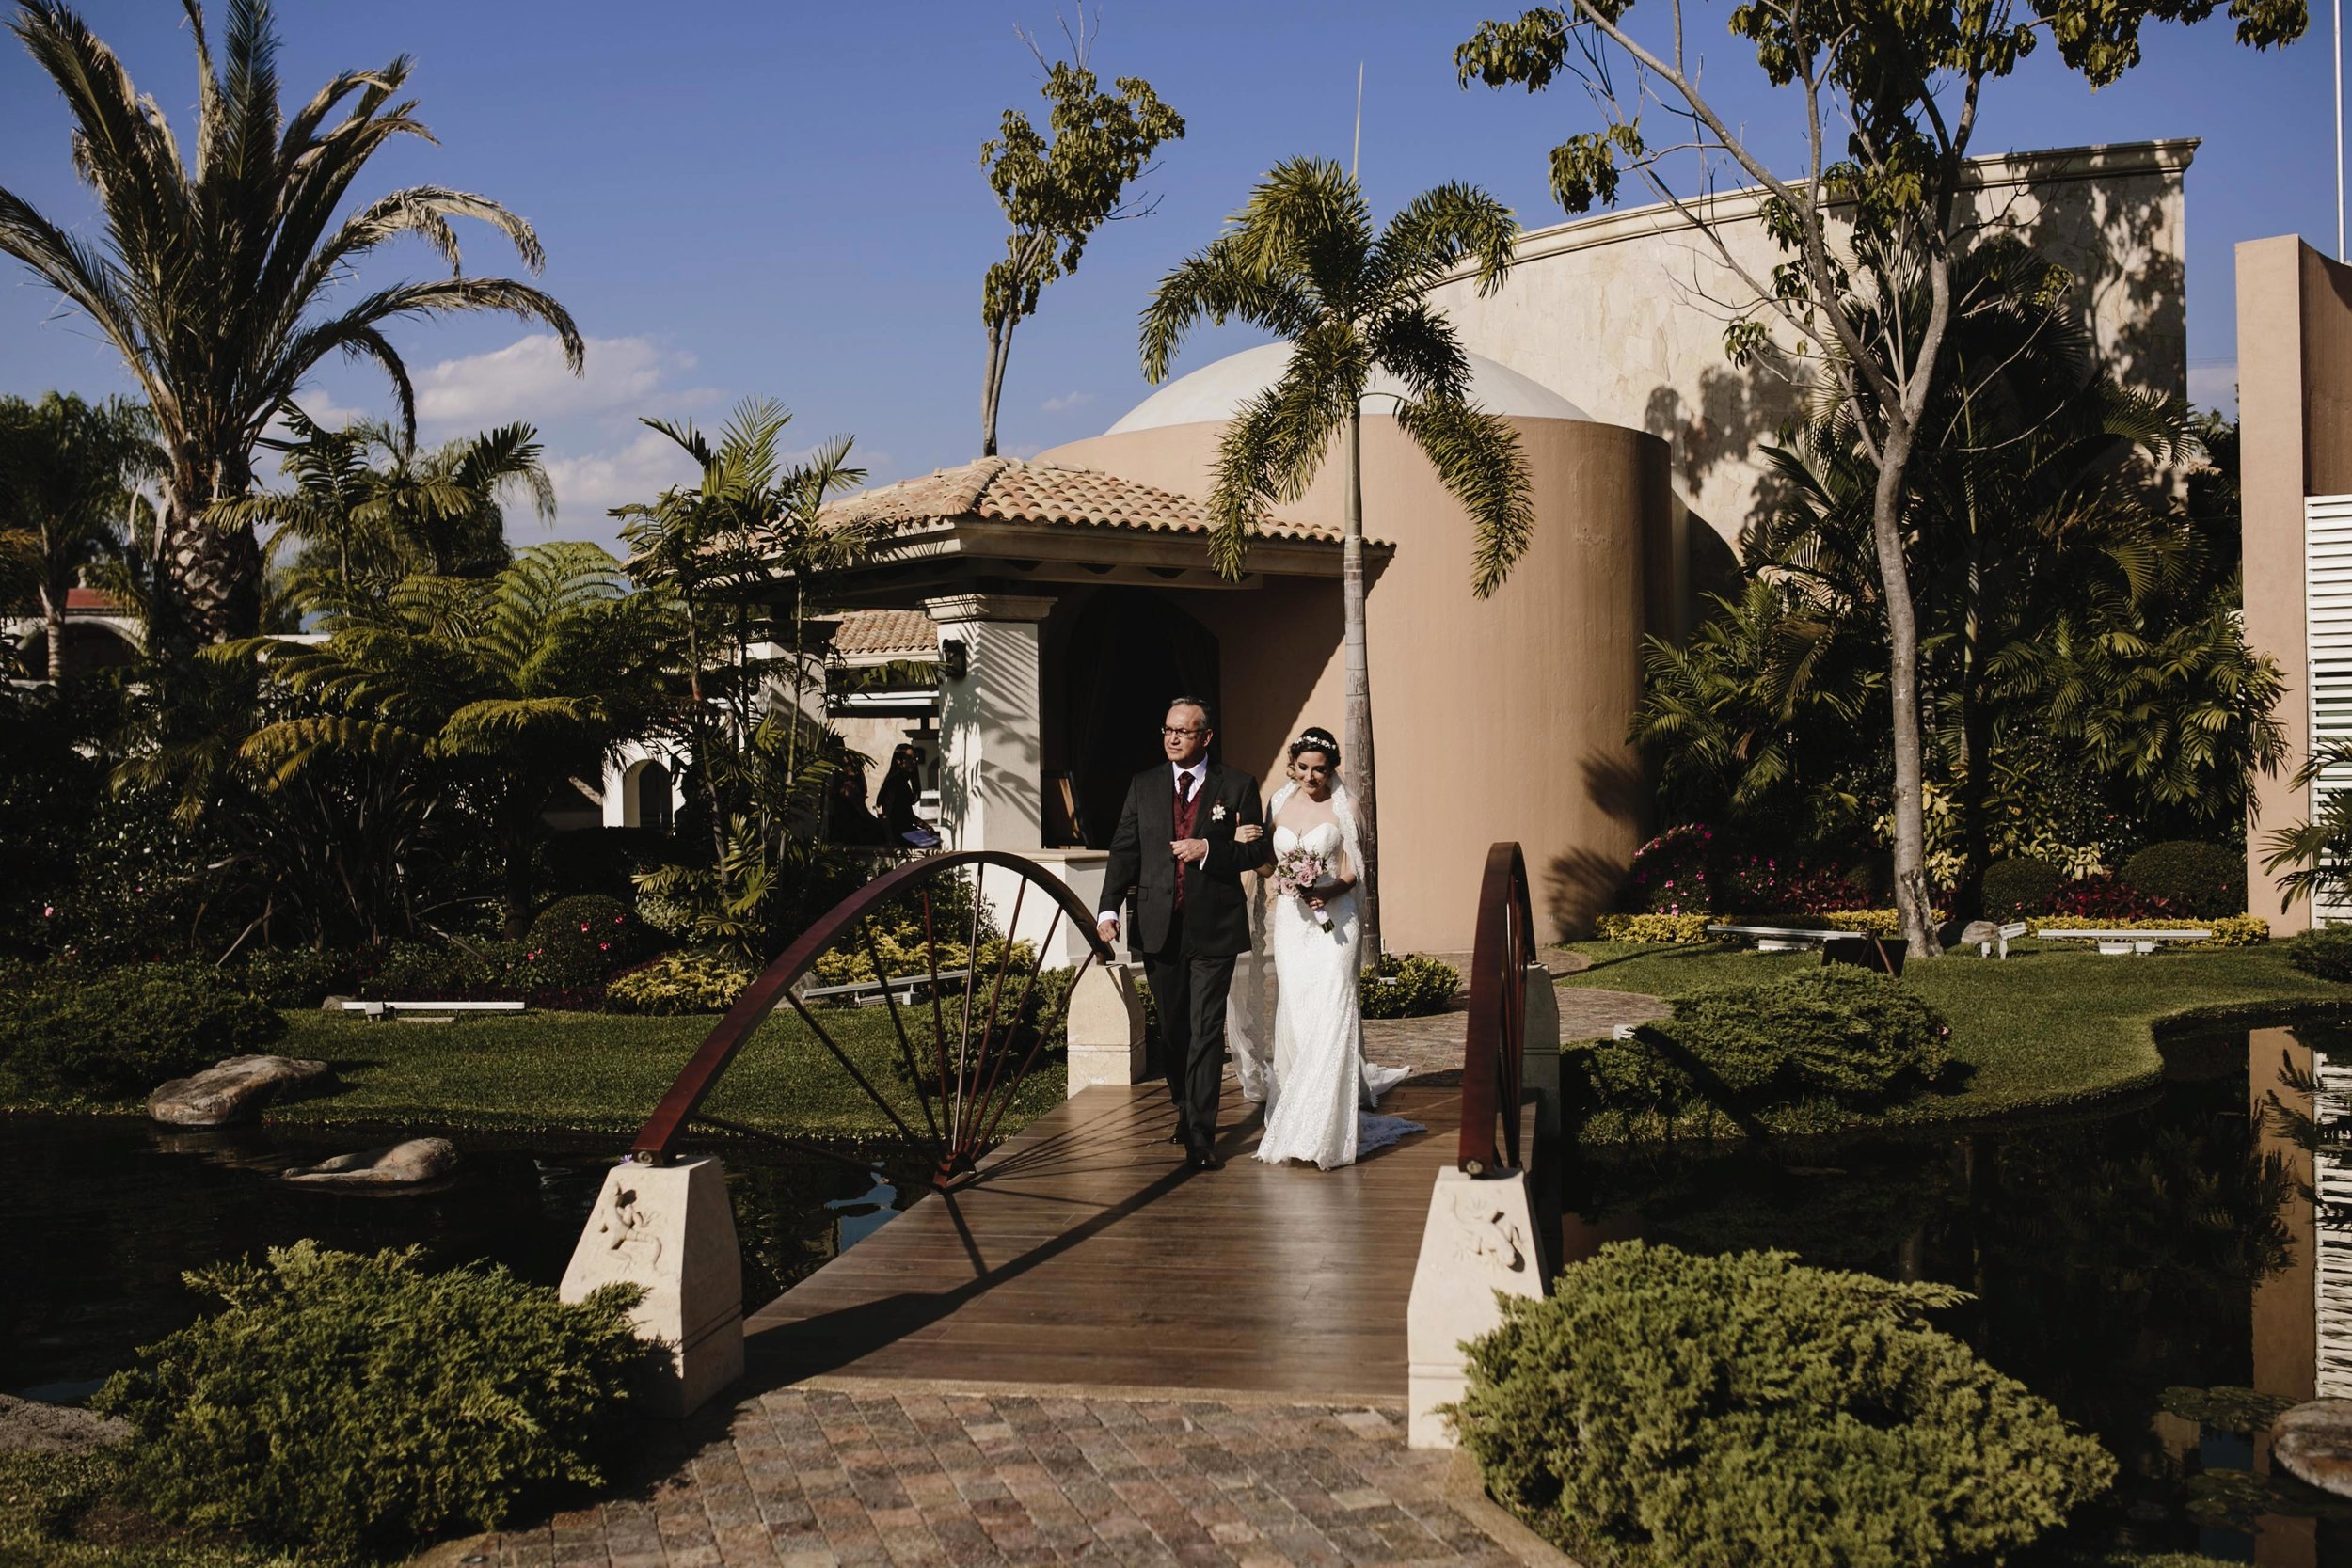 alfonso_flores_destination_wedding_photography_jardin_amarello_cuernavaca53.jpg